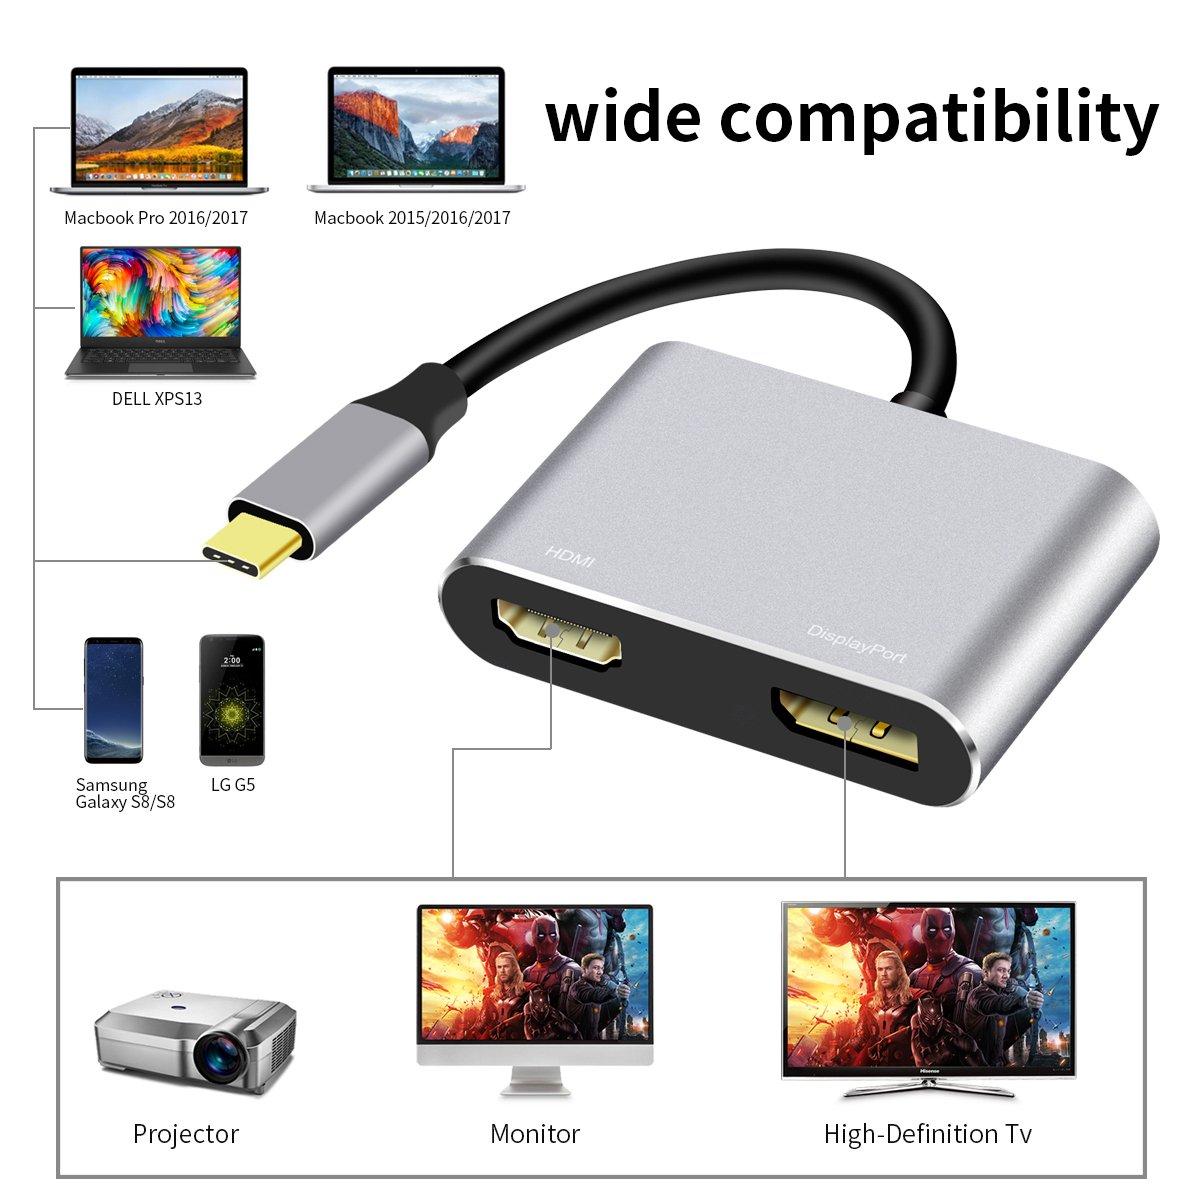 USB C to HDMI, USB-C (Thunderbolt 3) to Displayport (DP) 4K (60 HZ) UHD Converter Adapter